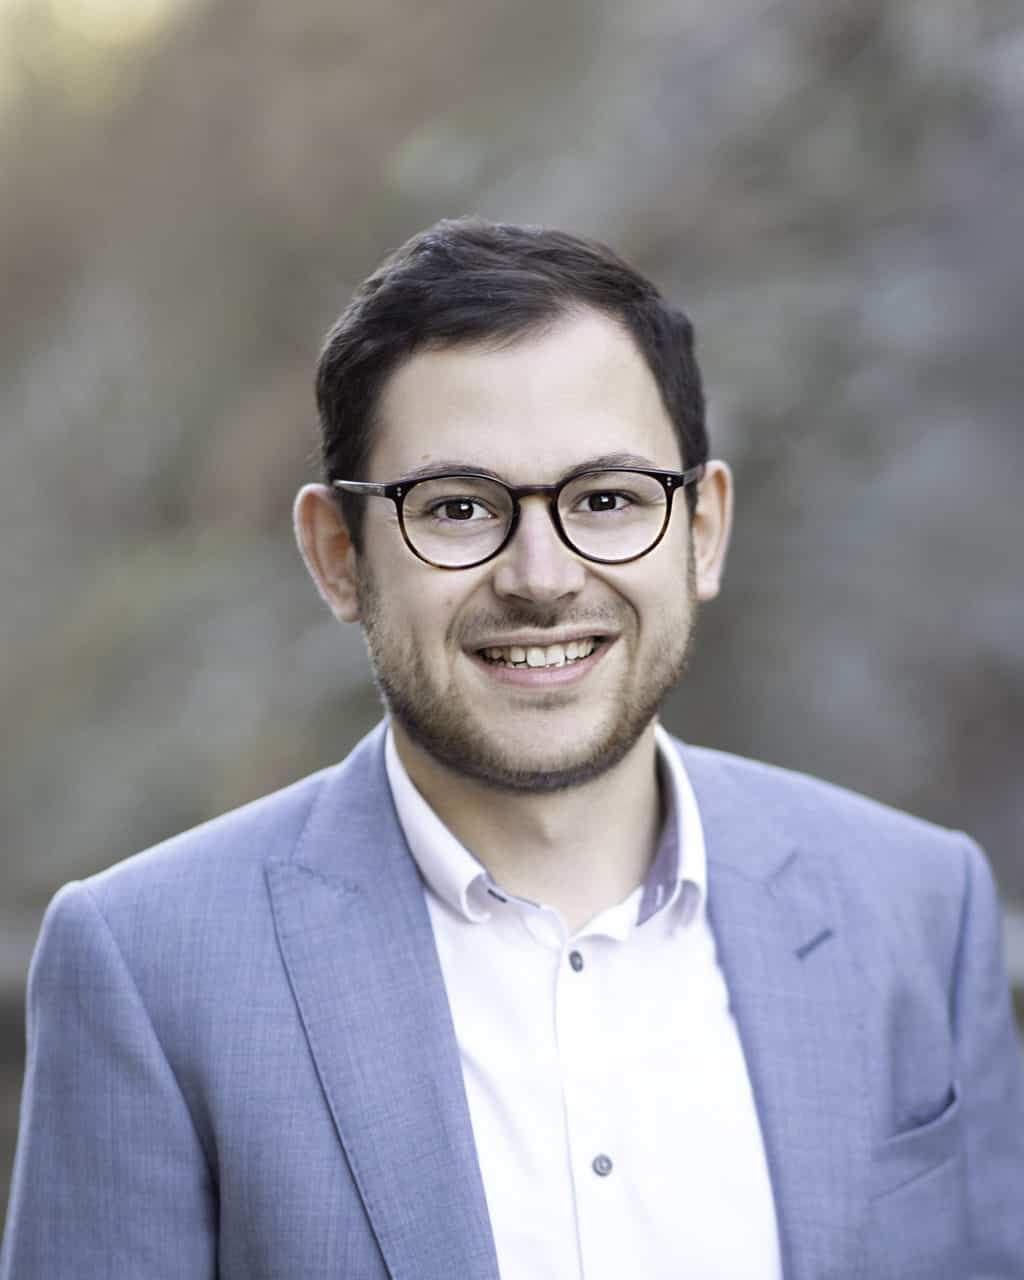 Emmanuel Kunz